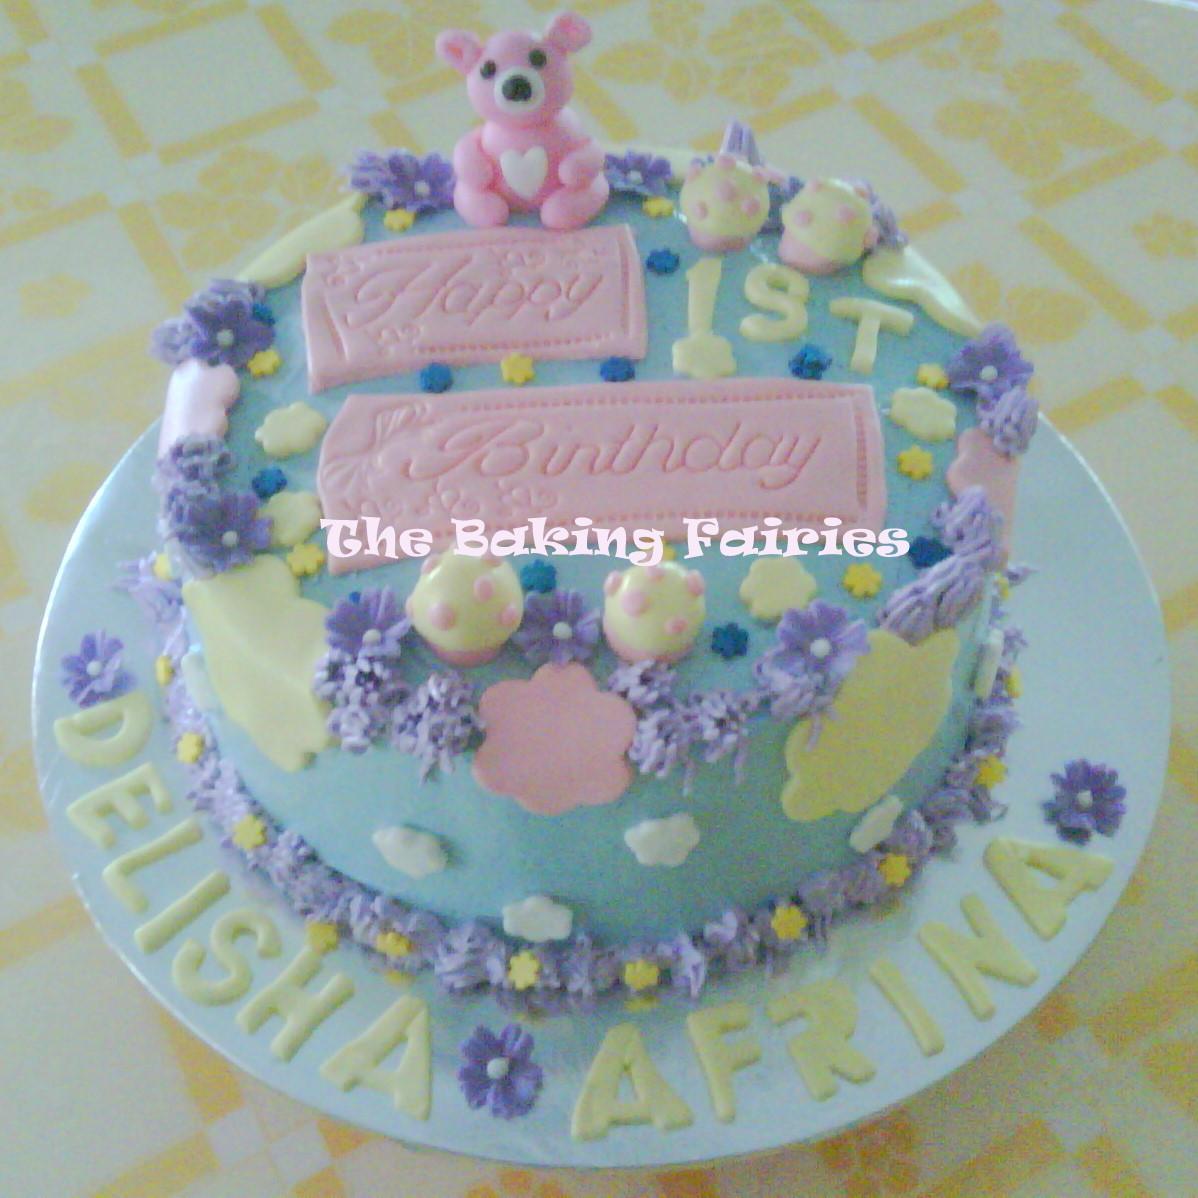 The Fairies Cake Dan Artinya : The Baking Fairies - Kek Dan Coklat di Ara Damansara, Selangor